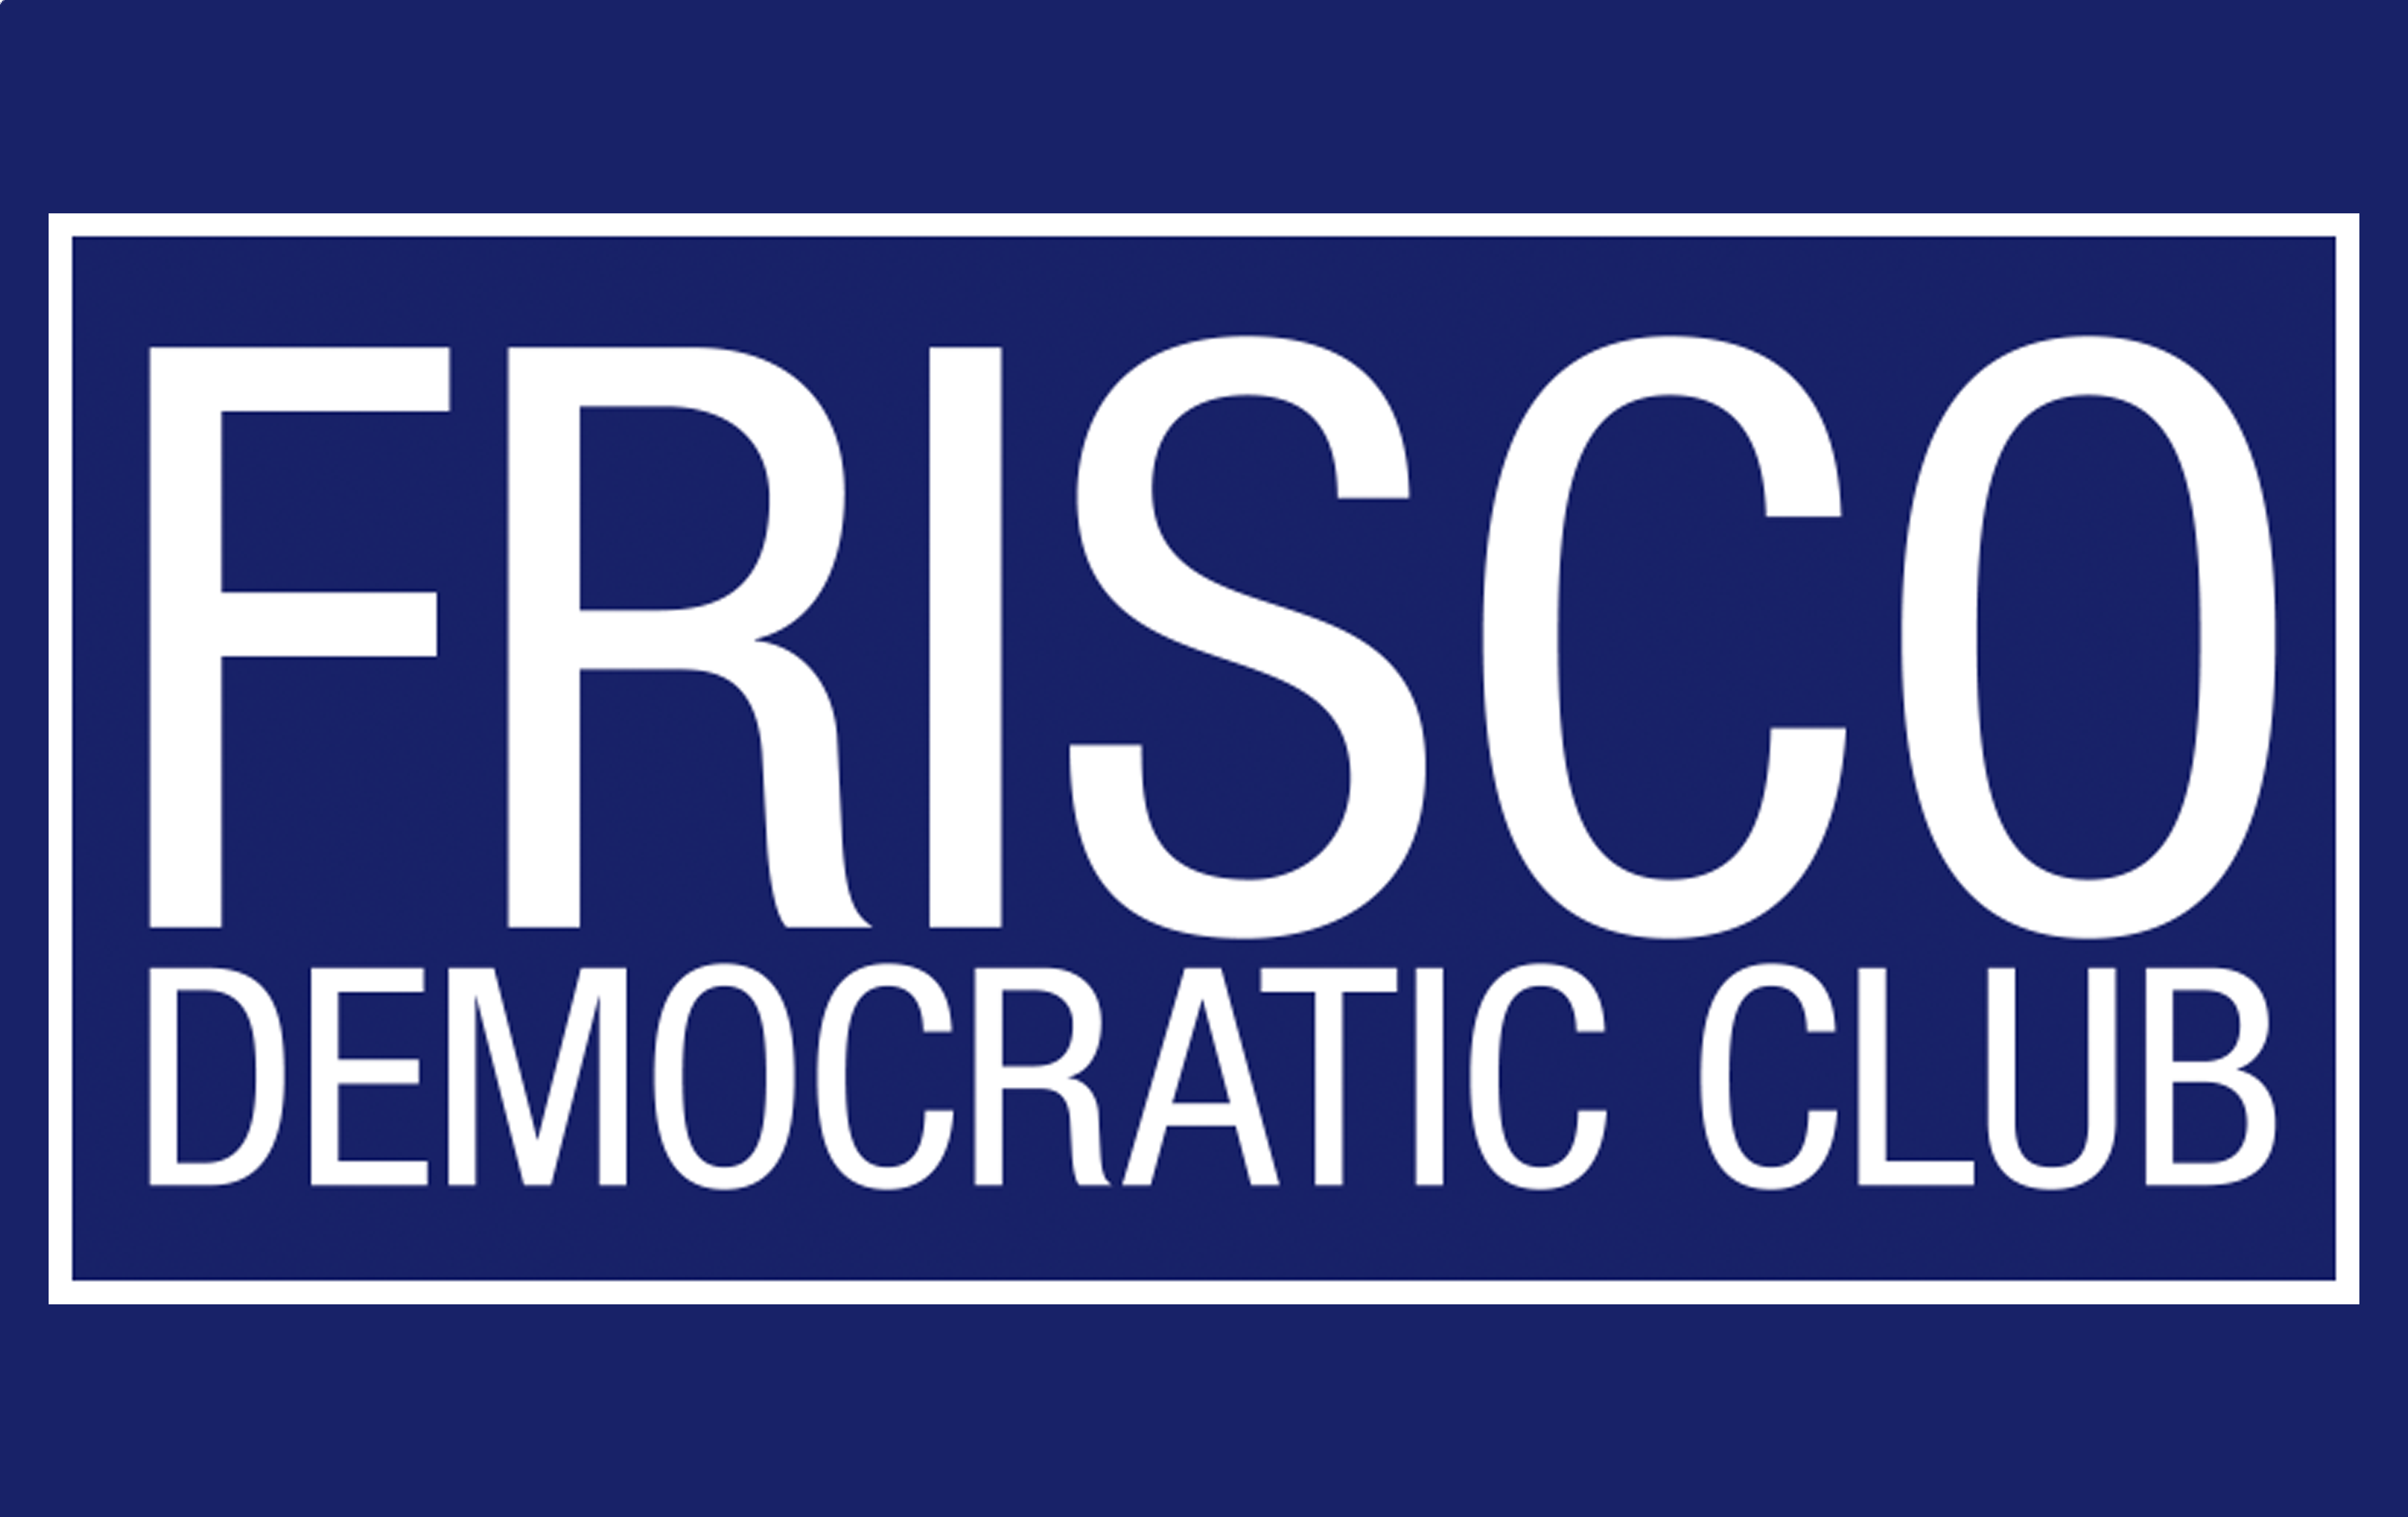 Frisco Democratic Club (TX)